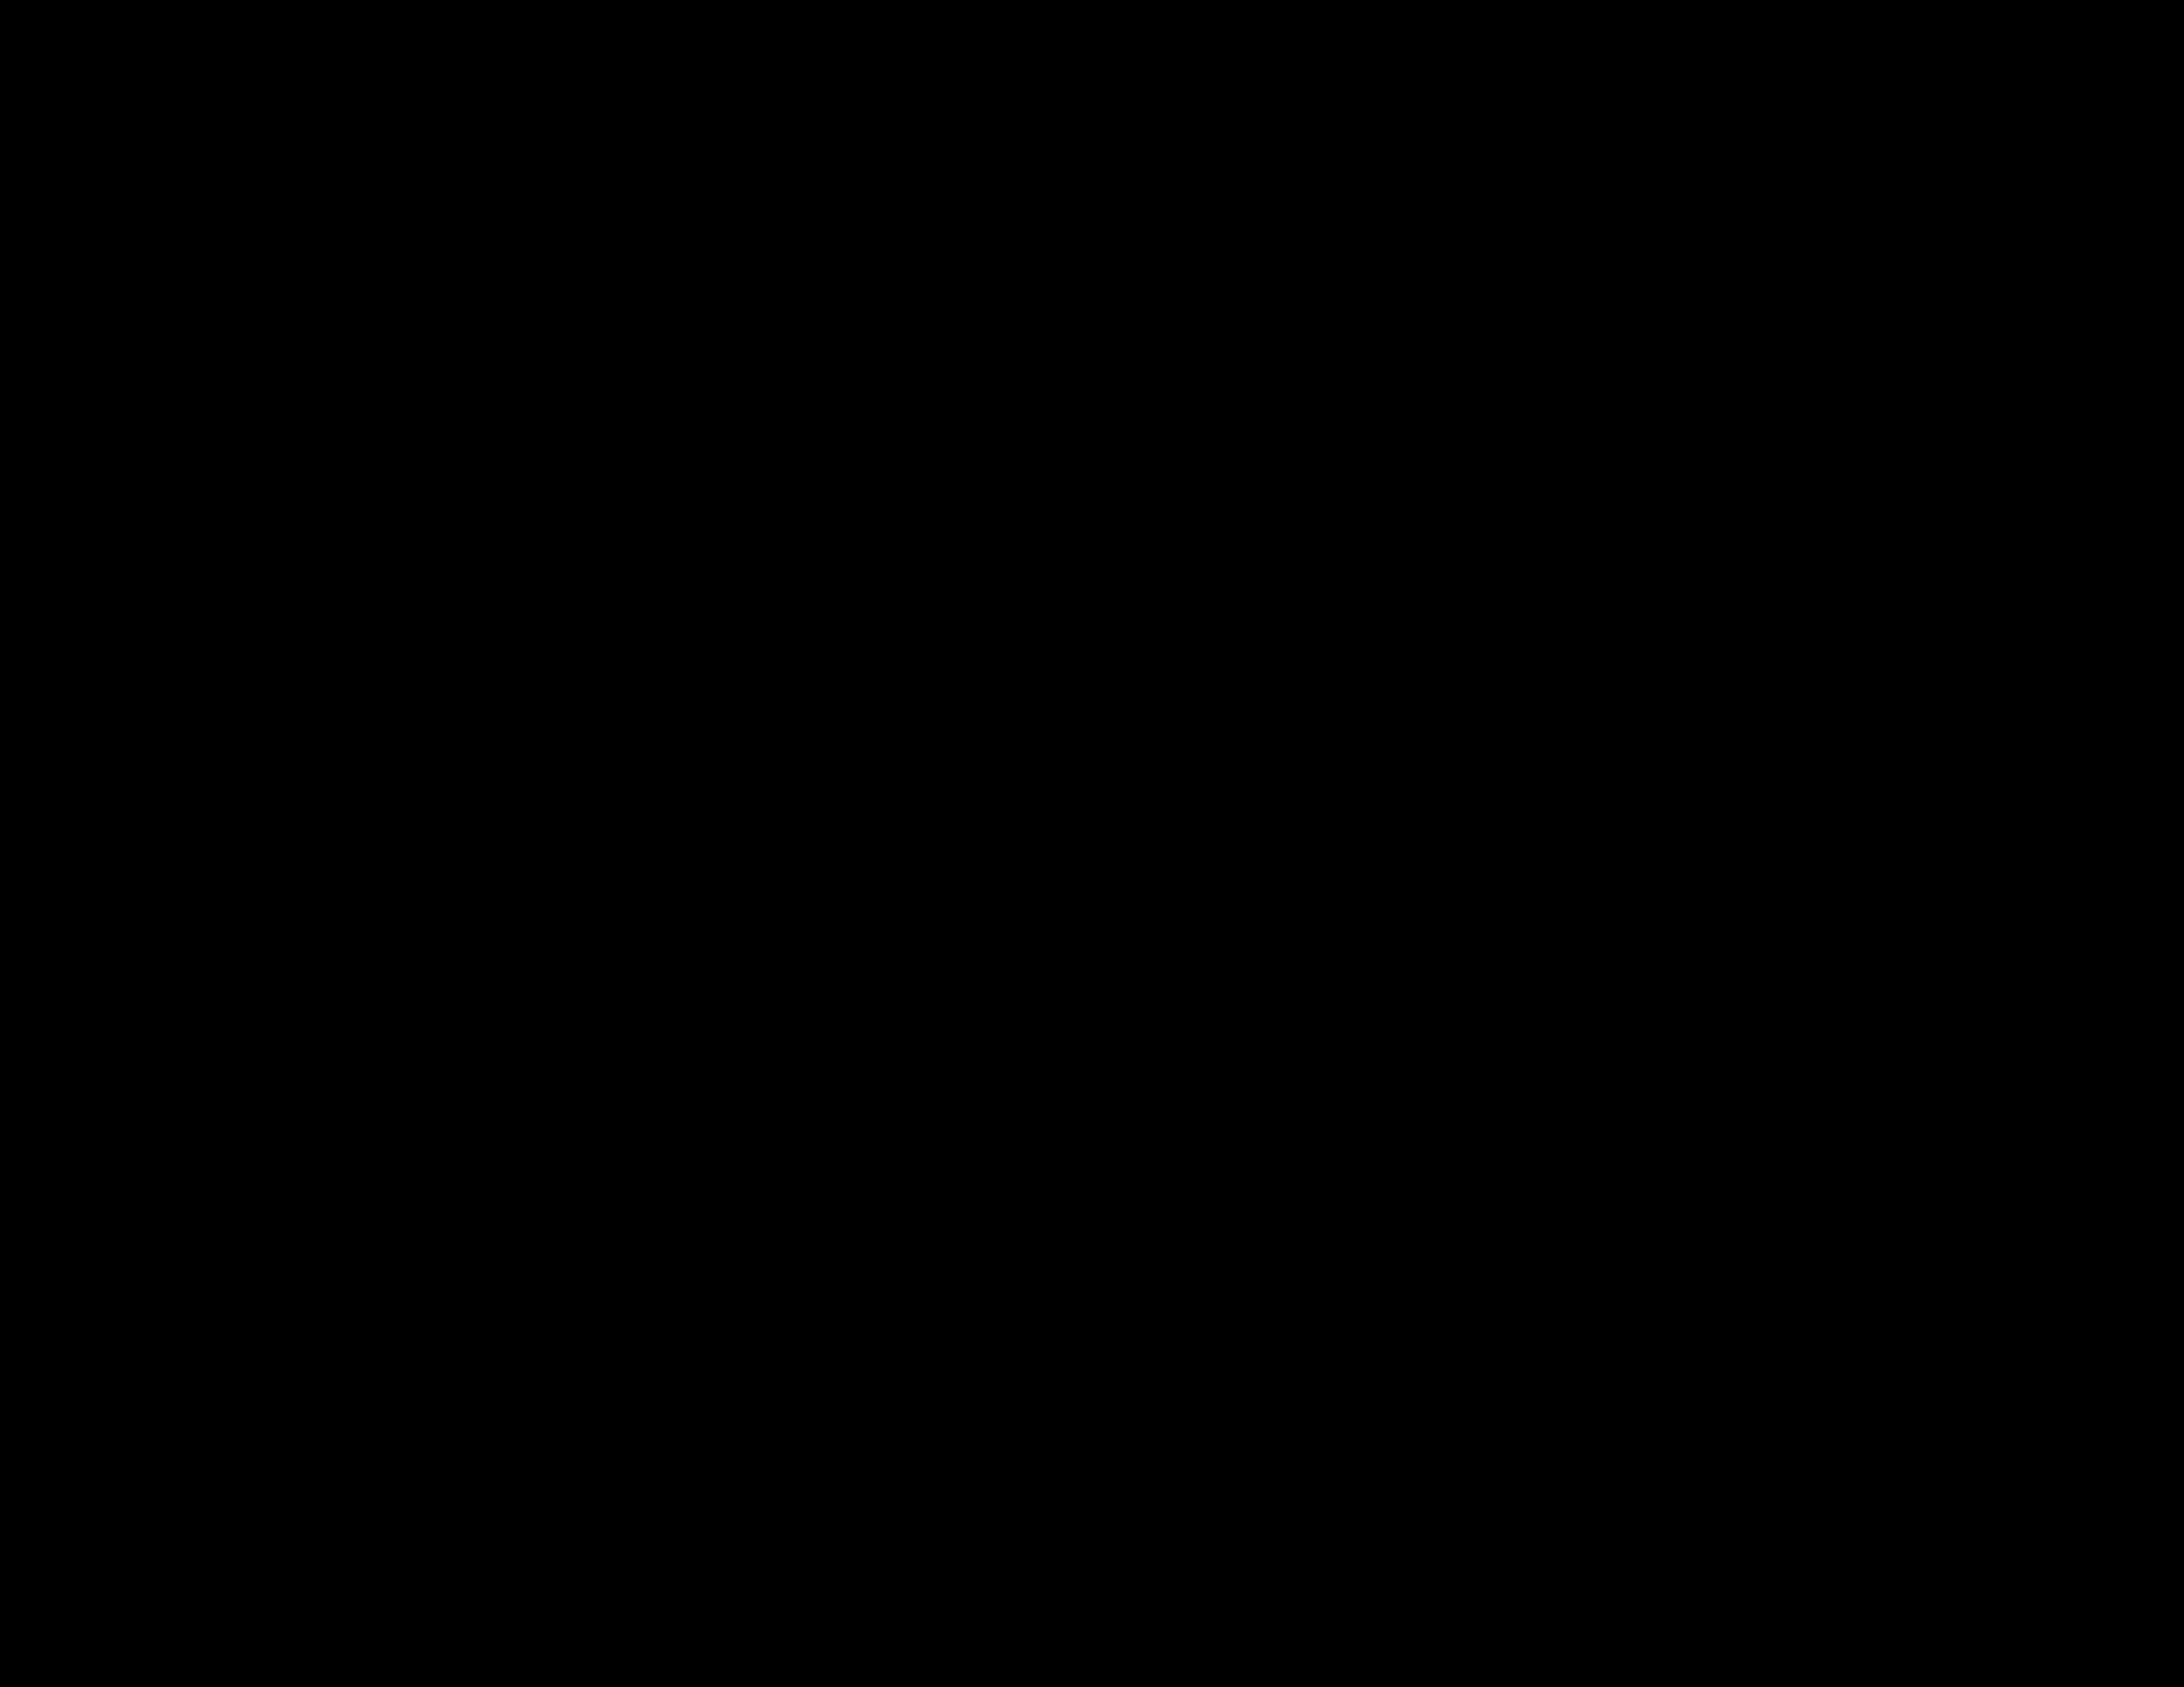 "MSR200 – 18"" Wide Panel 24 gauge, standard"